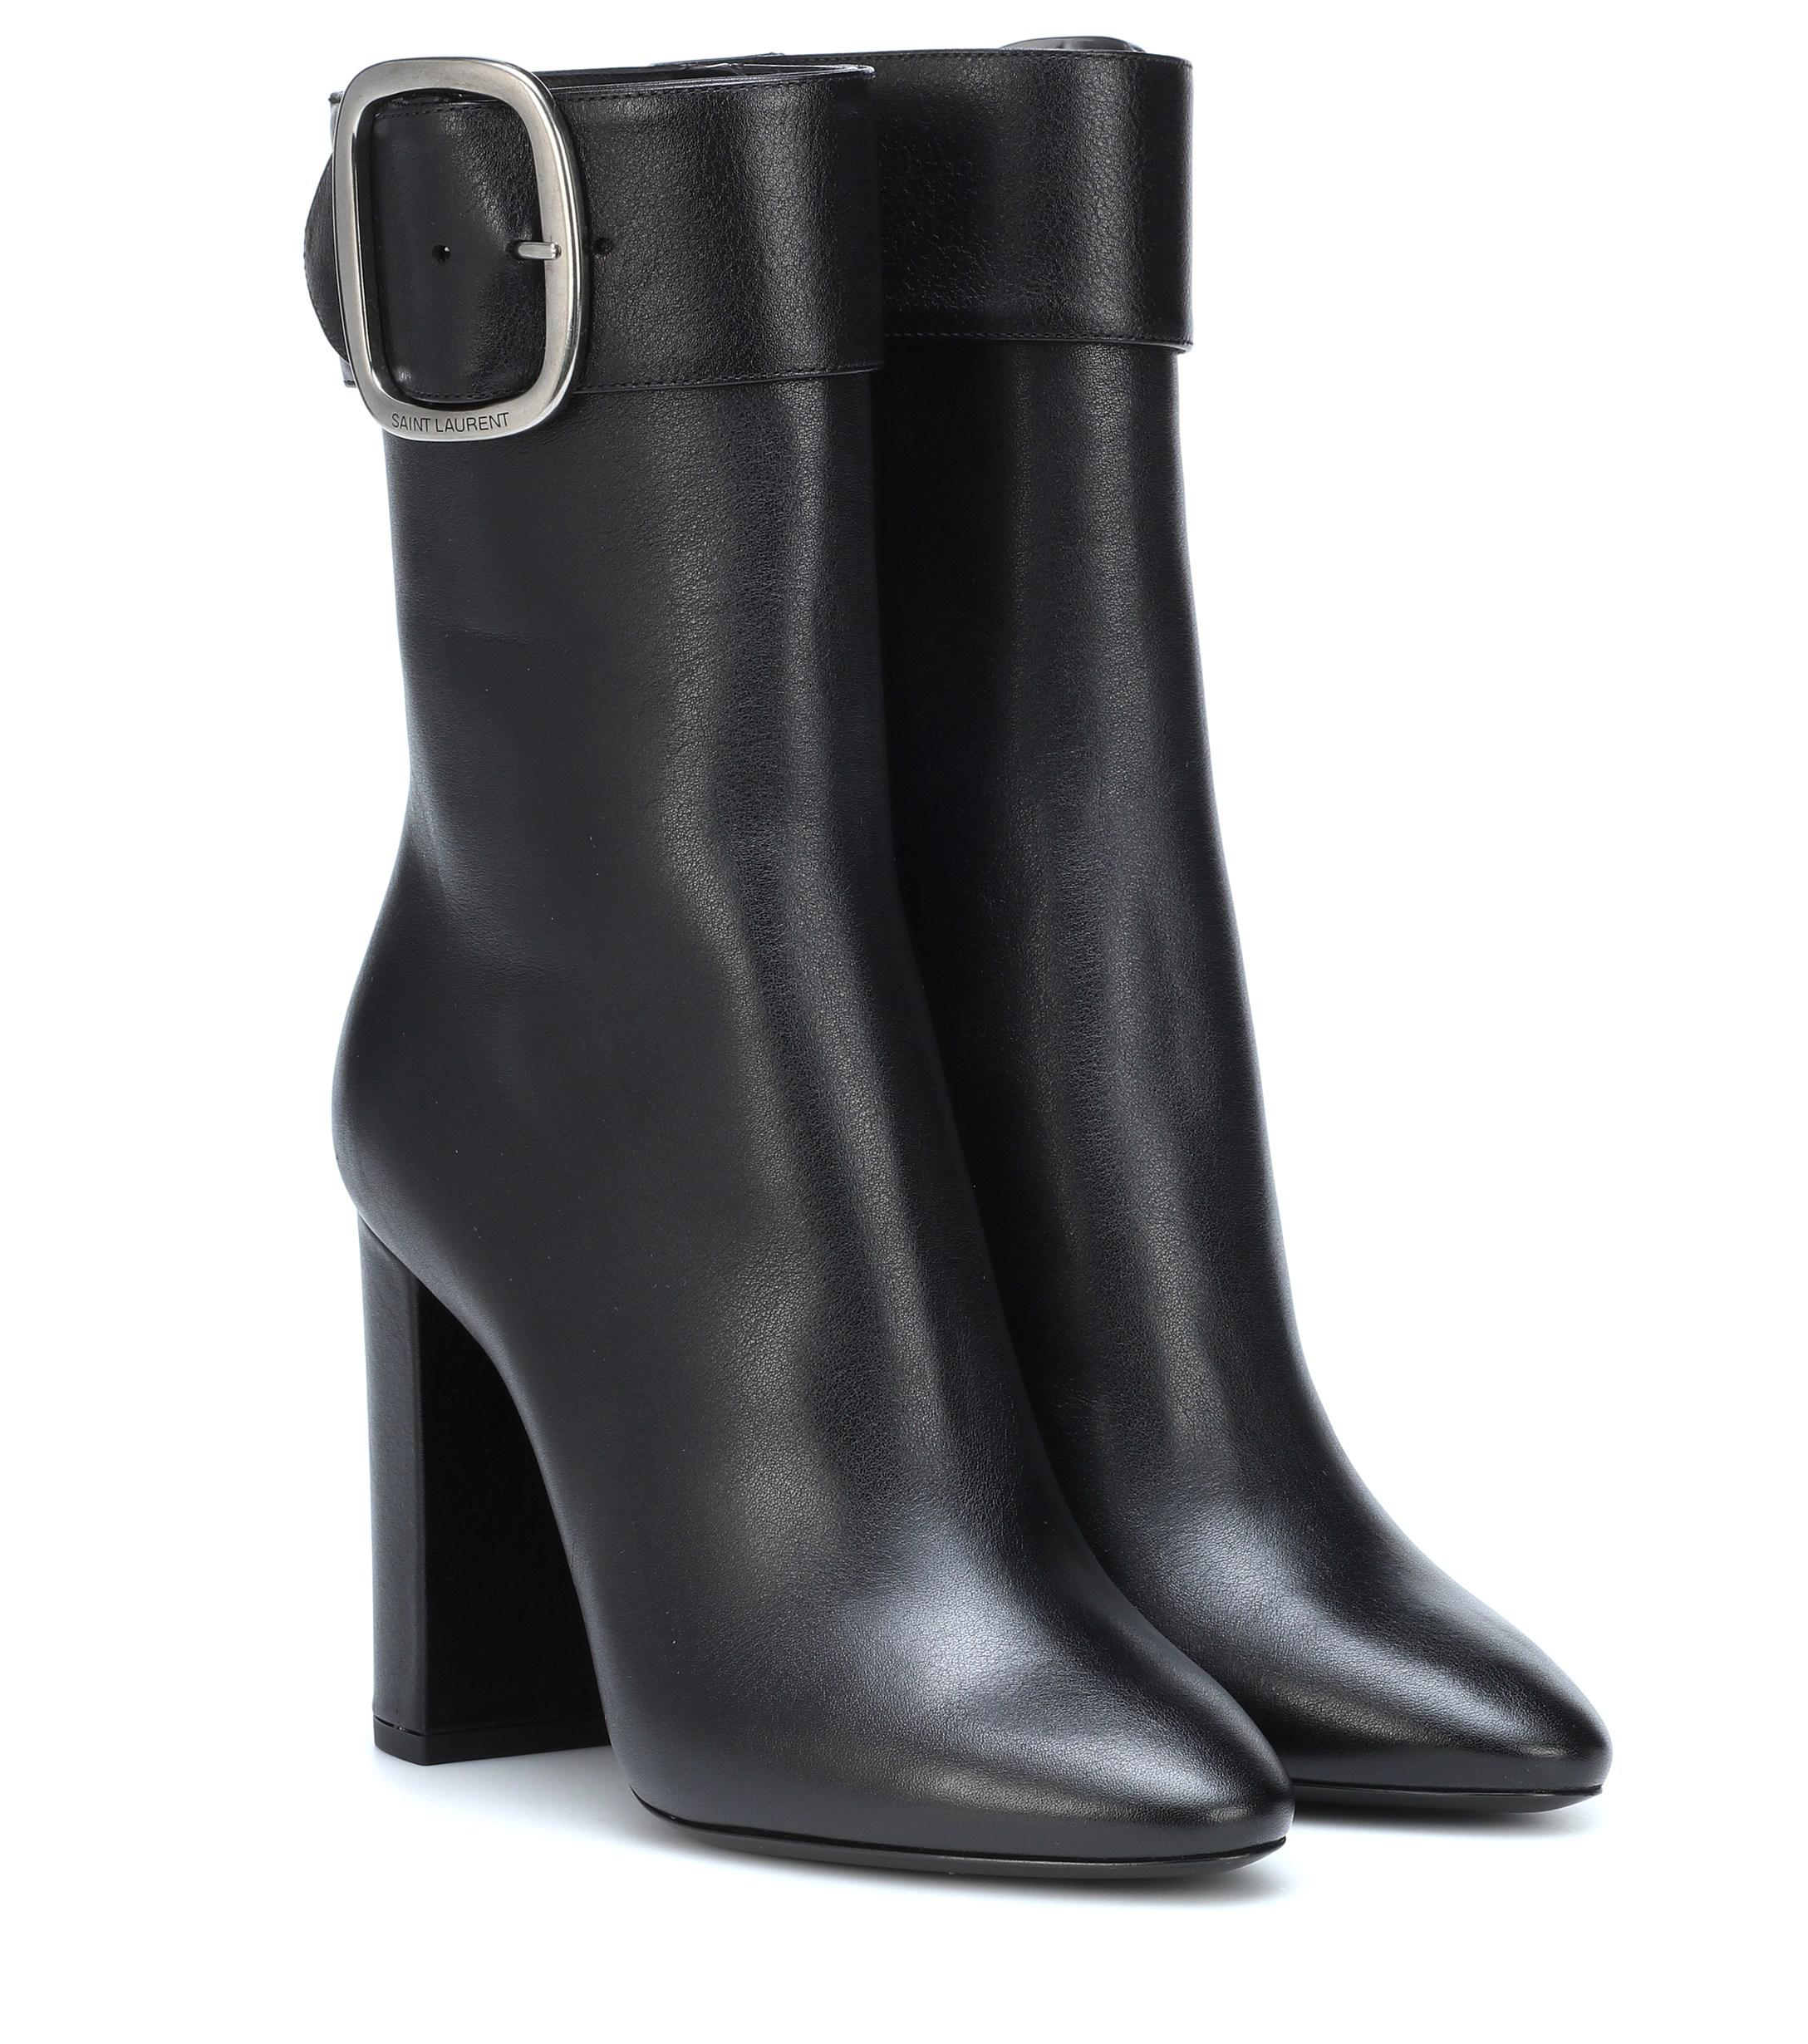 d3896da9cbf Saint Laurent - Black Joplin Leather Ankle Boots - Lyst. View fullscreen